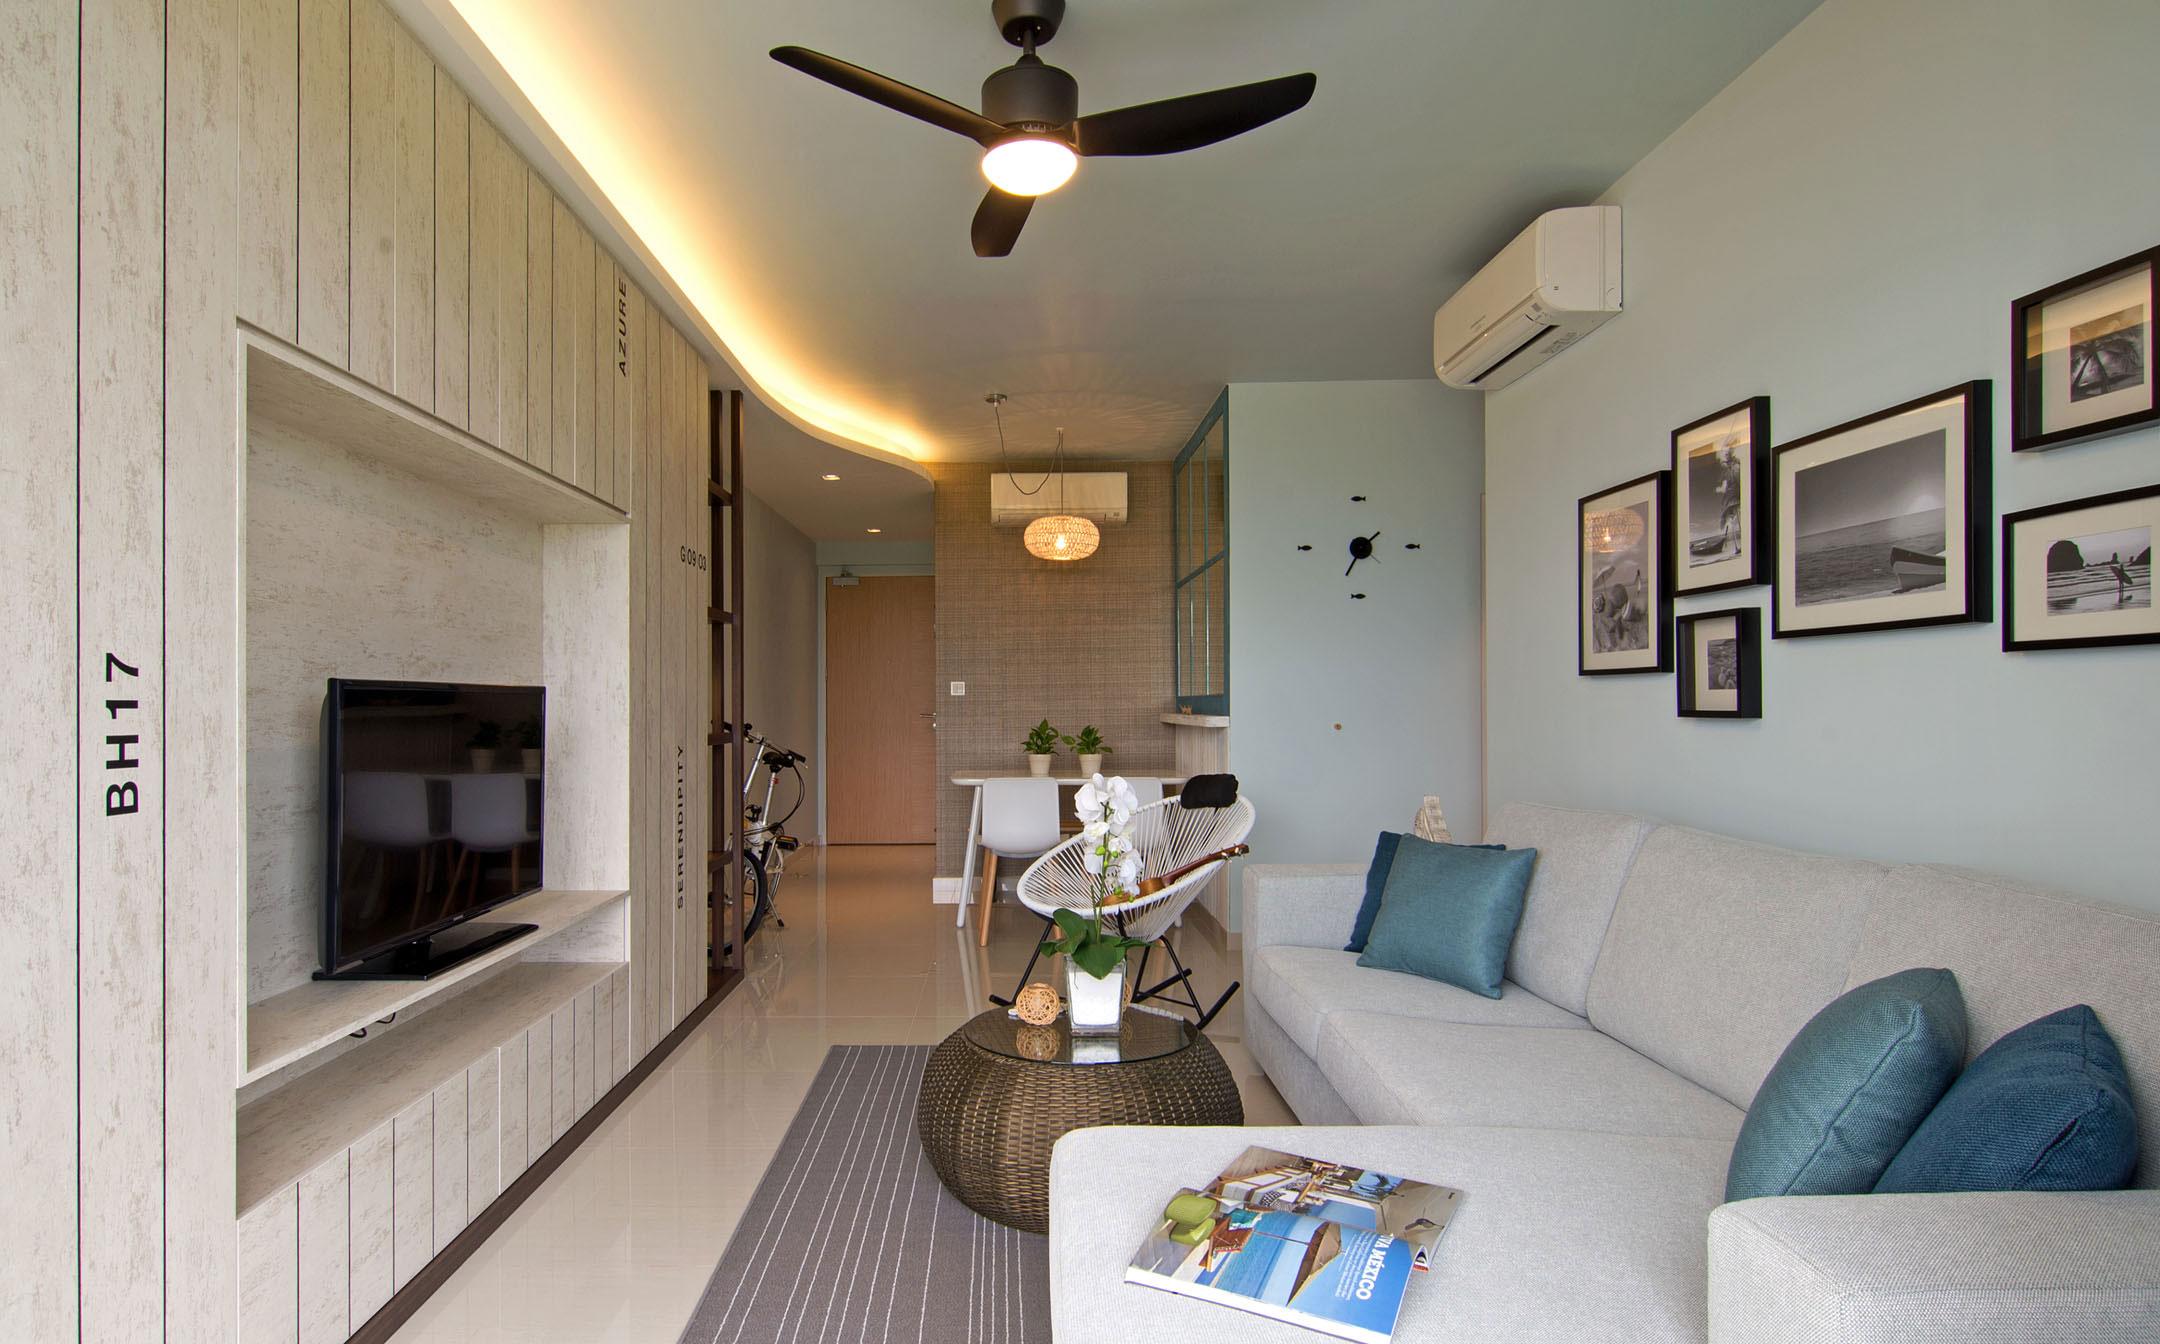 Beach house urban apartment in Singapore by Vievva Designers-08